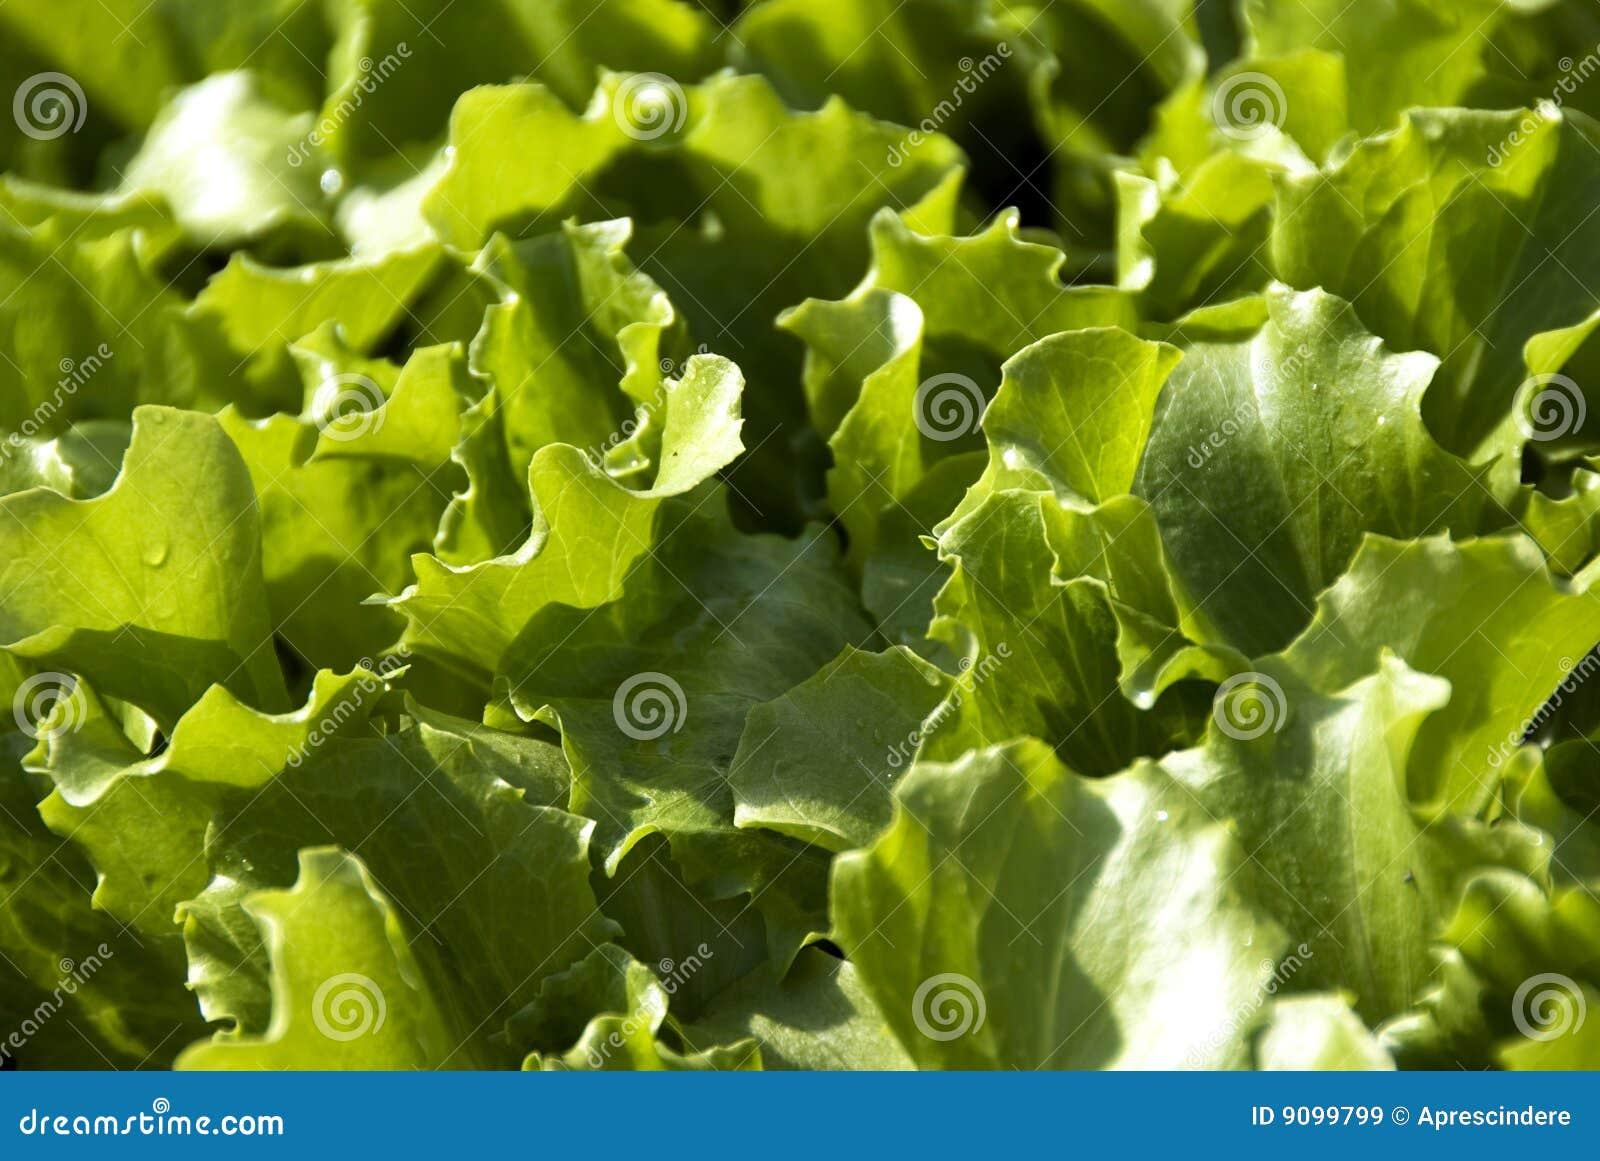 Kopfsalatblätter